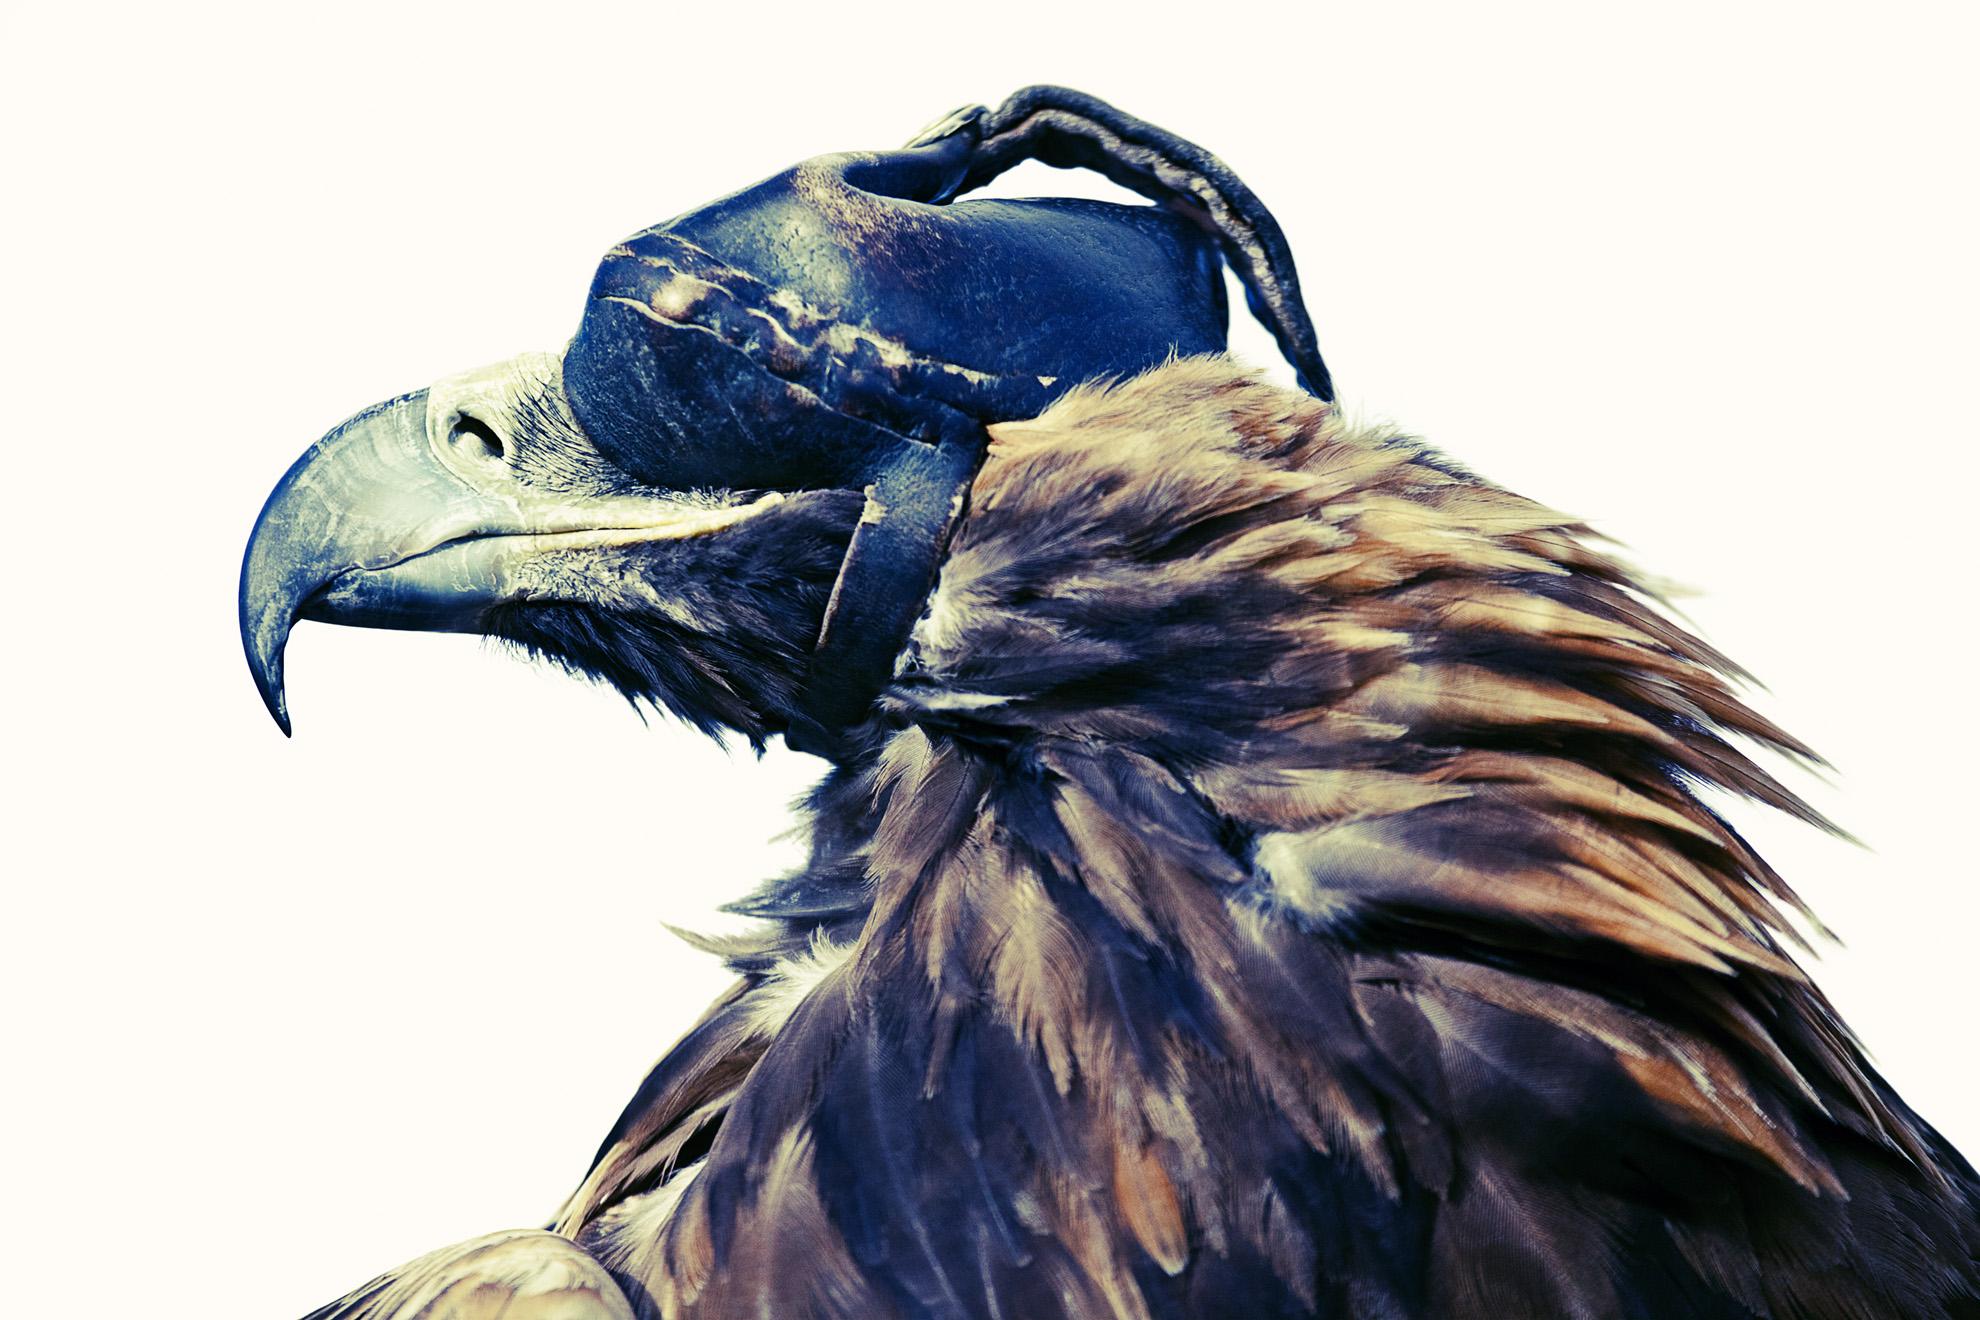 Owerko_Eagle Hunter print_1.jpg